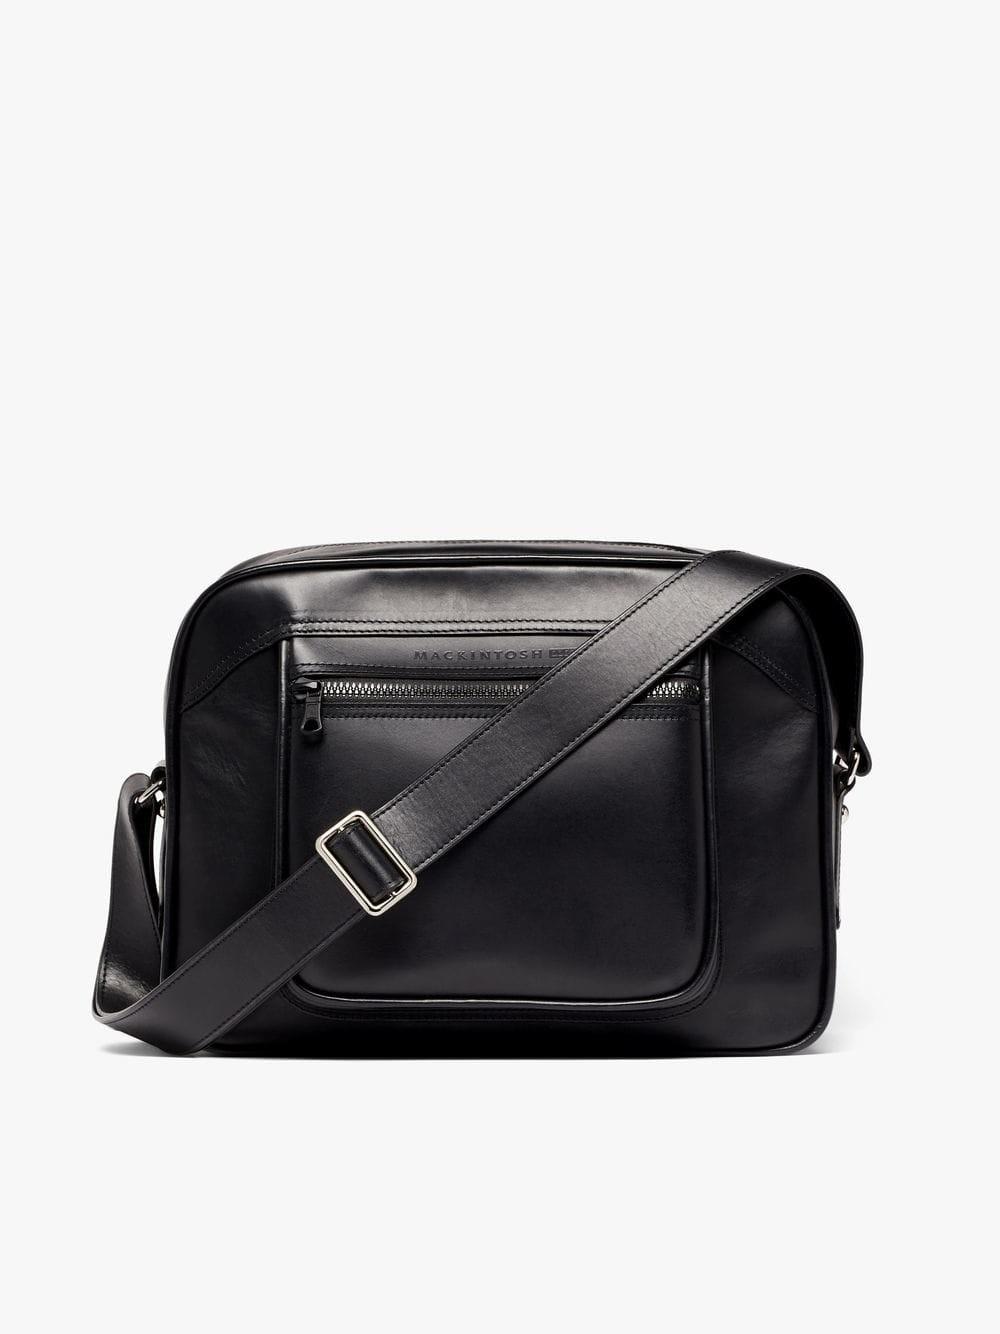 On Sale: Black Leather 0003 Bowling Bag